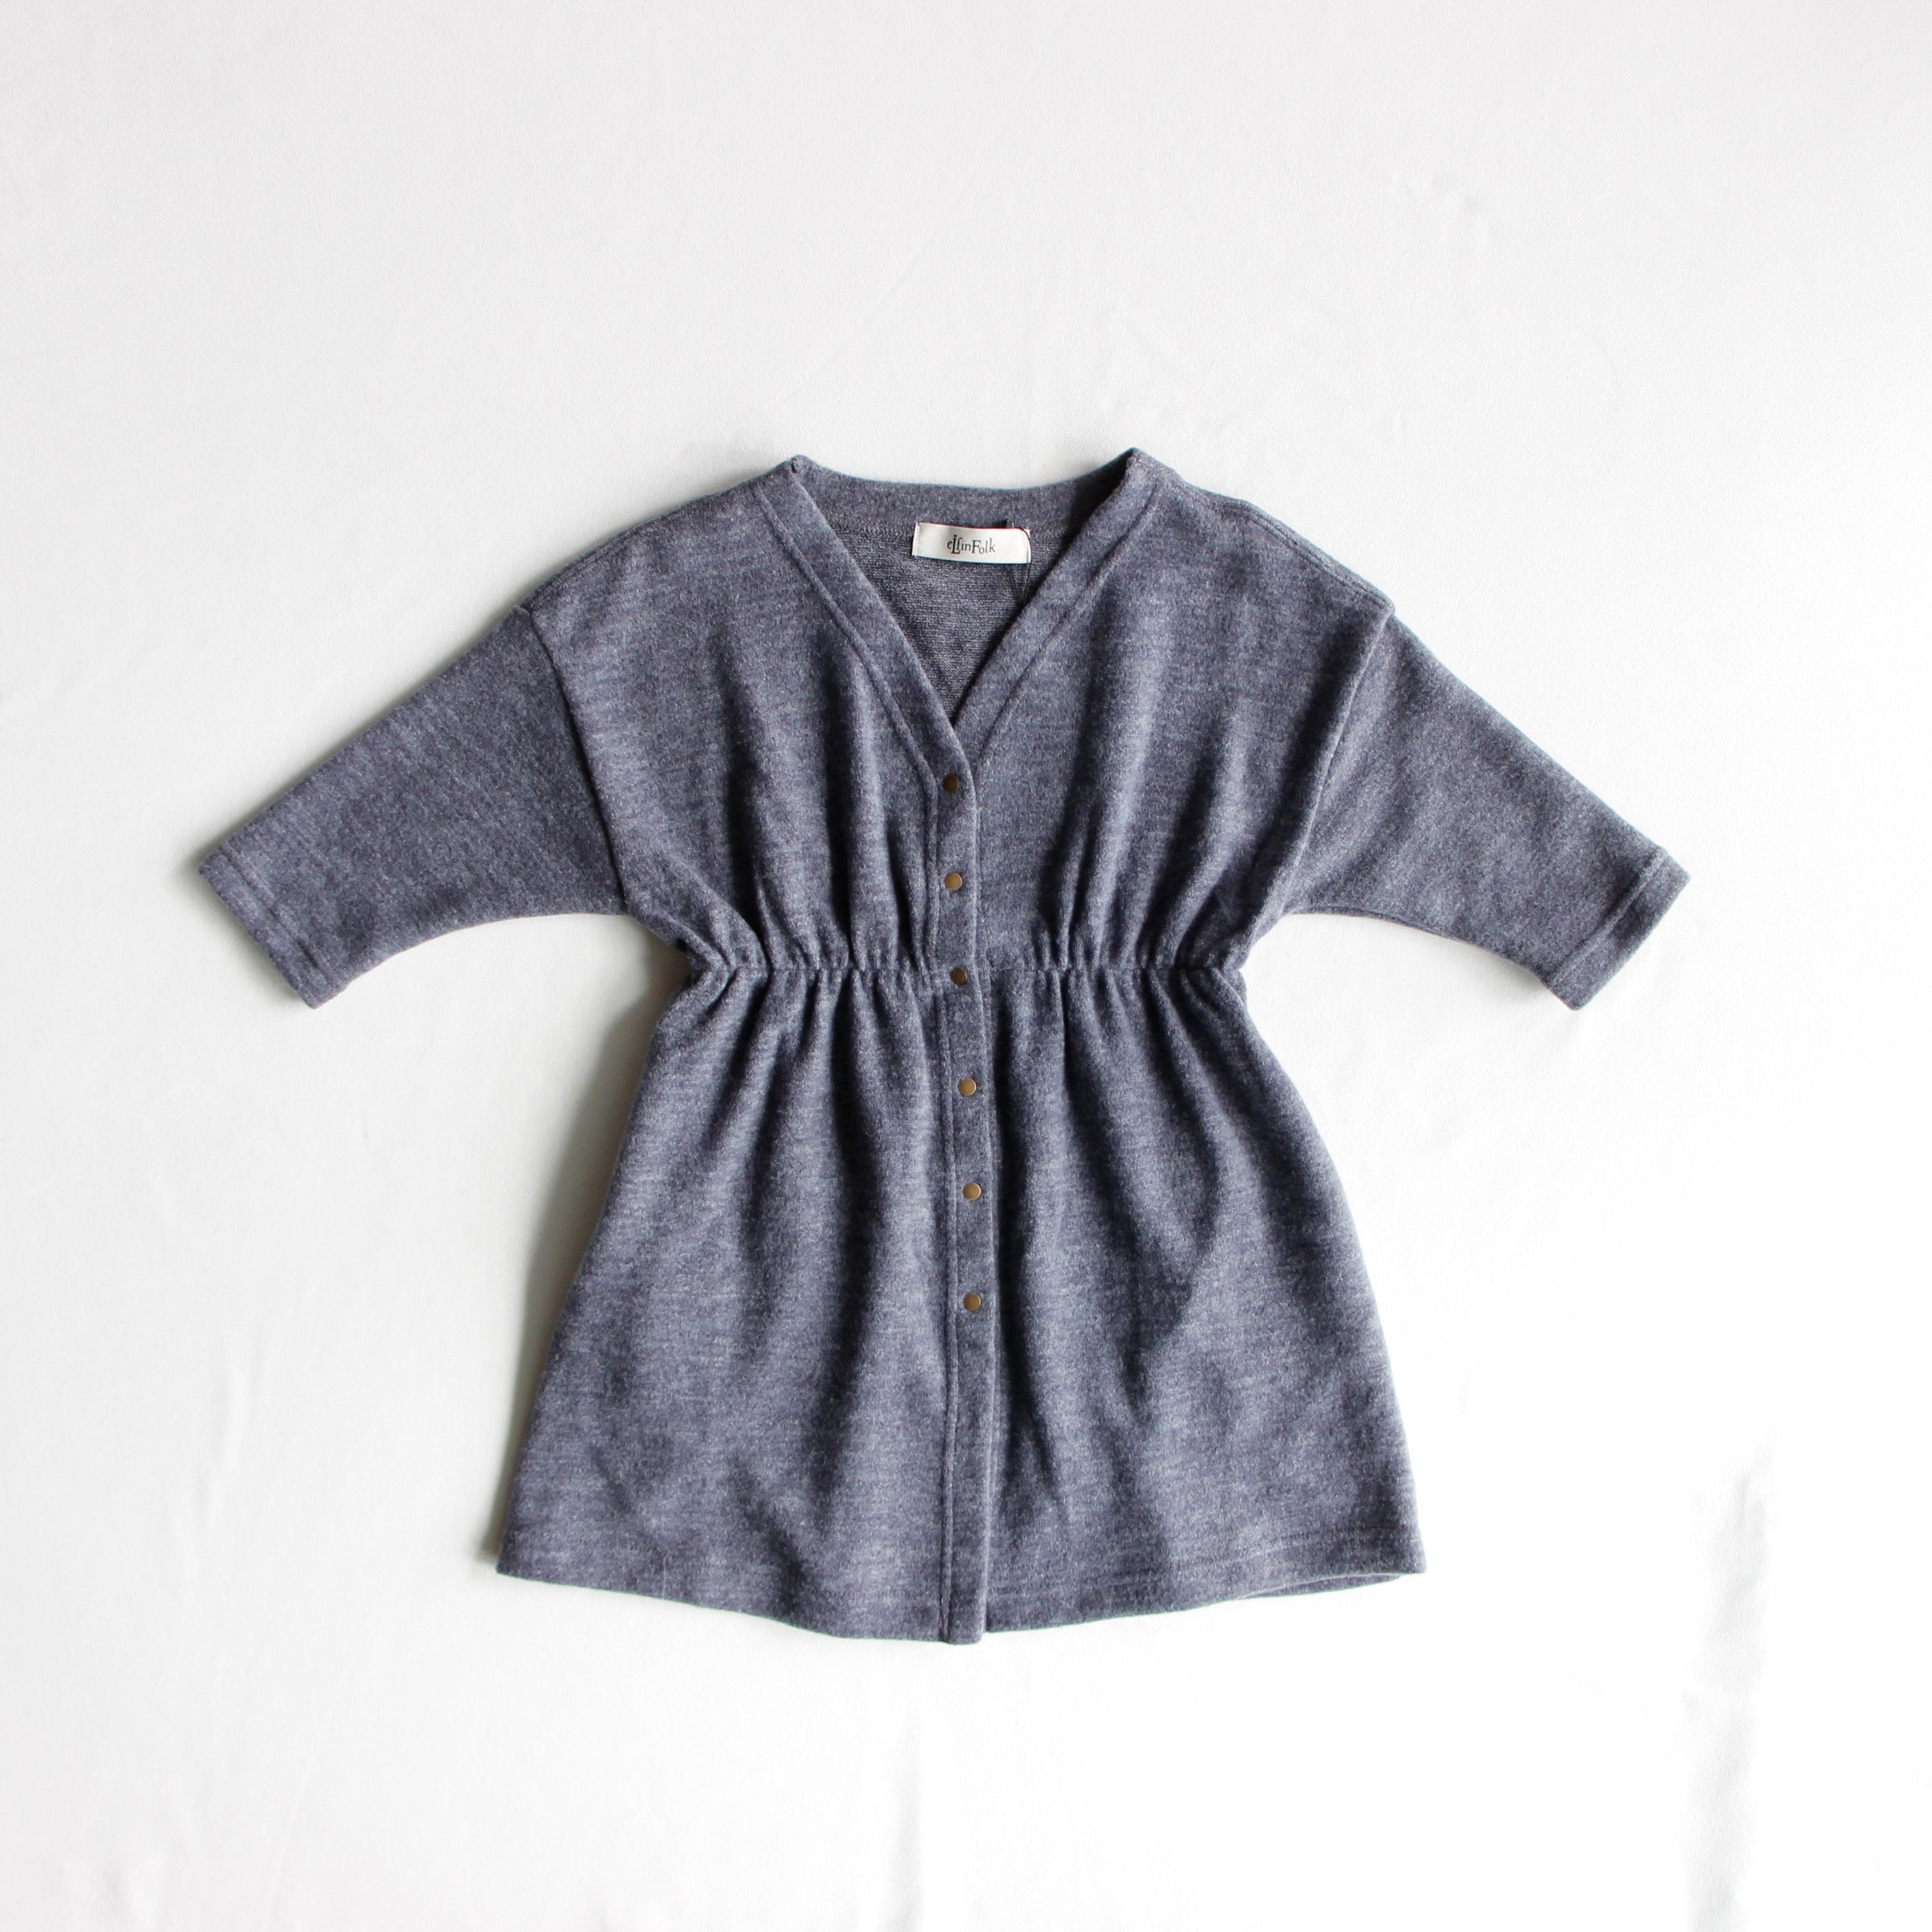 《eLfinFolk 2018AW》melange gown dress / gray / 110・130cm